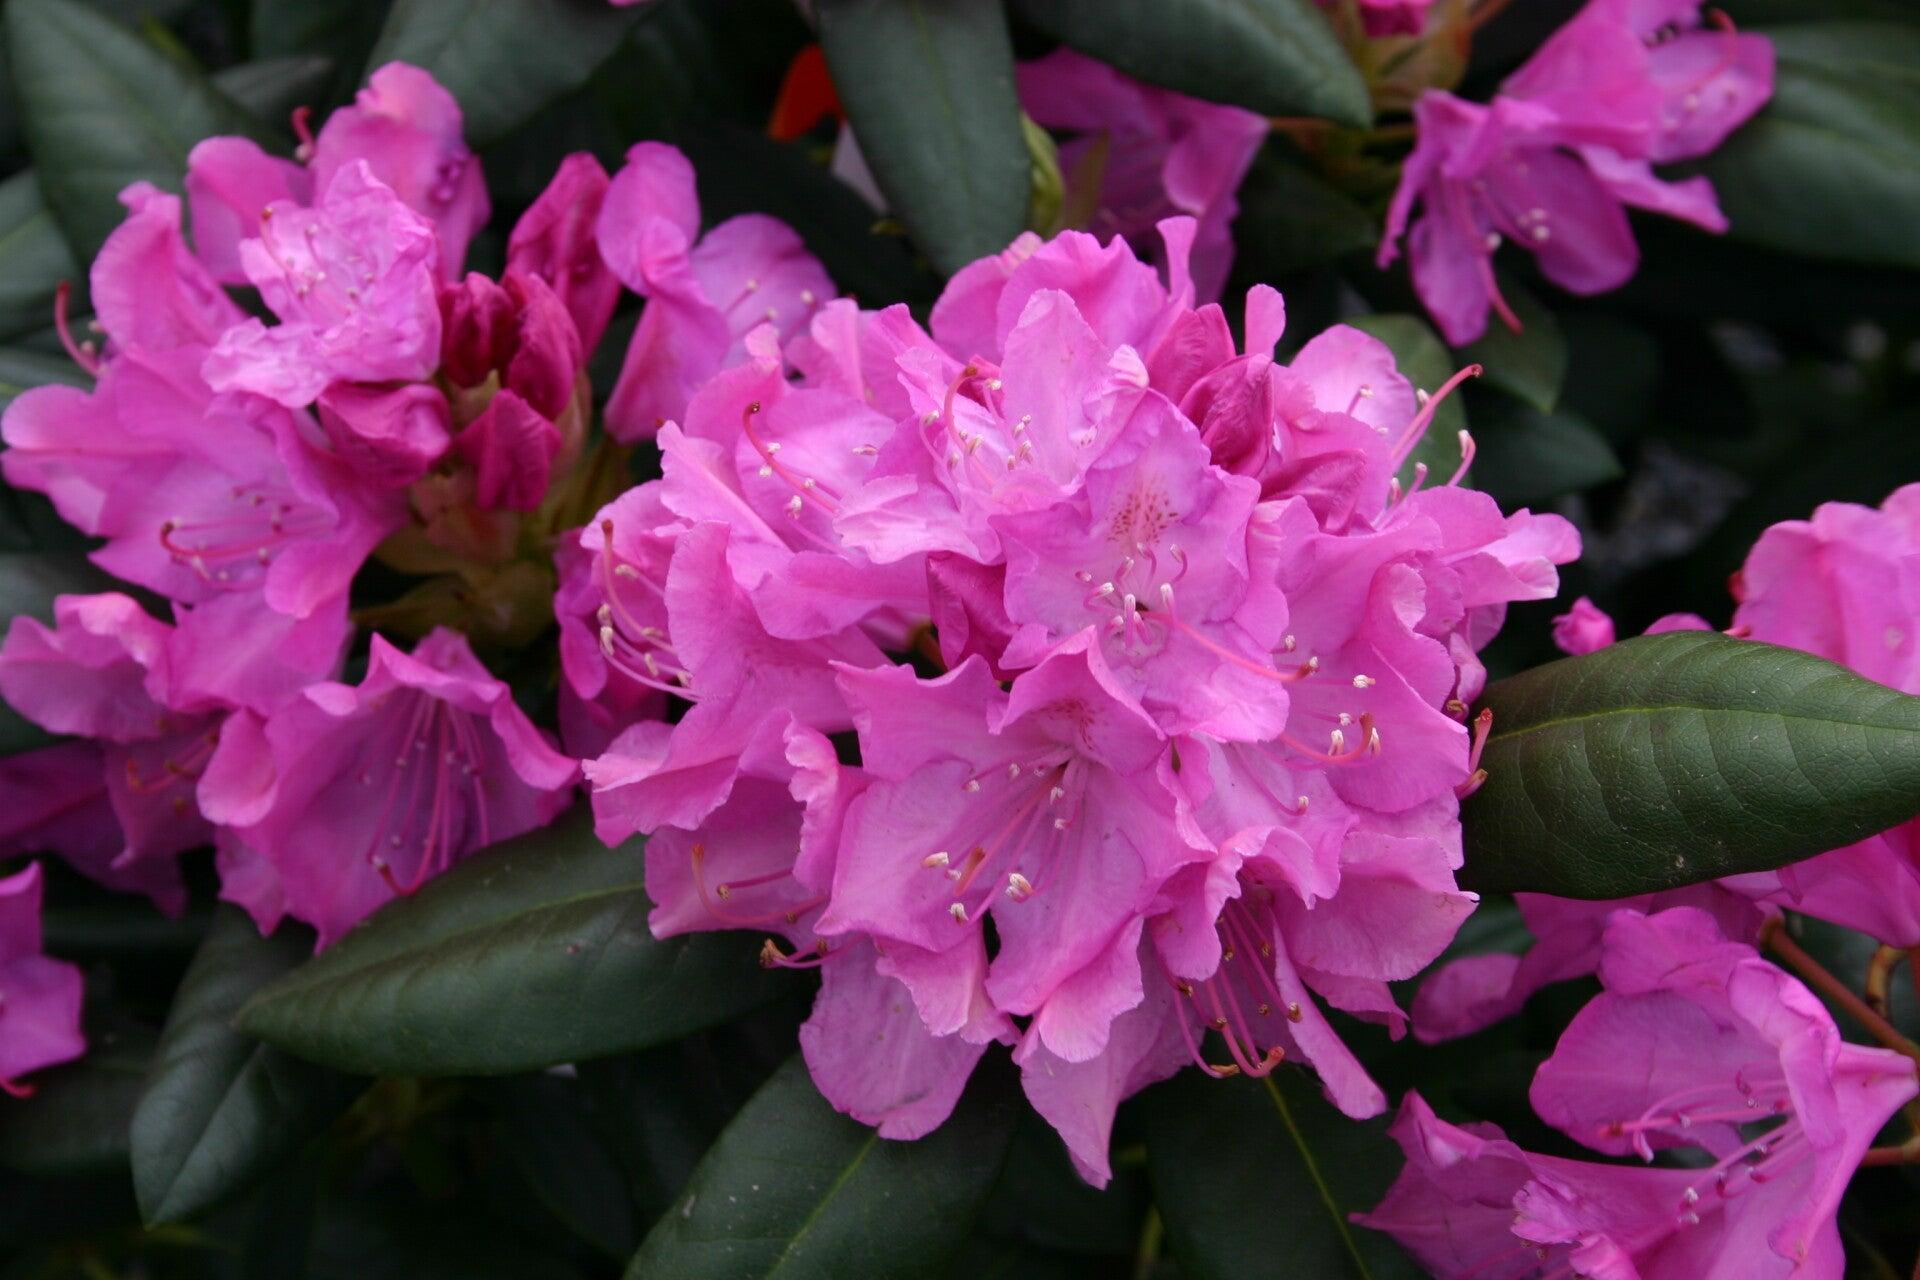 https://f.jwwb.nl/public/i/r/m/temp-fidtqrdxrremhohxocfm/moy3r4/Rhododendron_roseum_elegans_8501.jpg